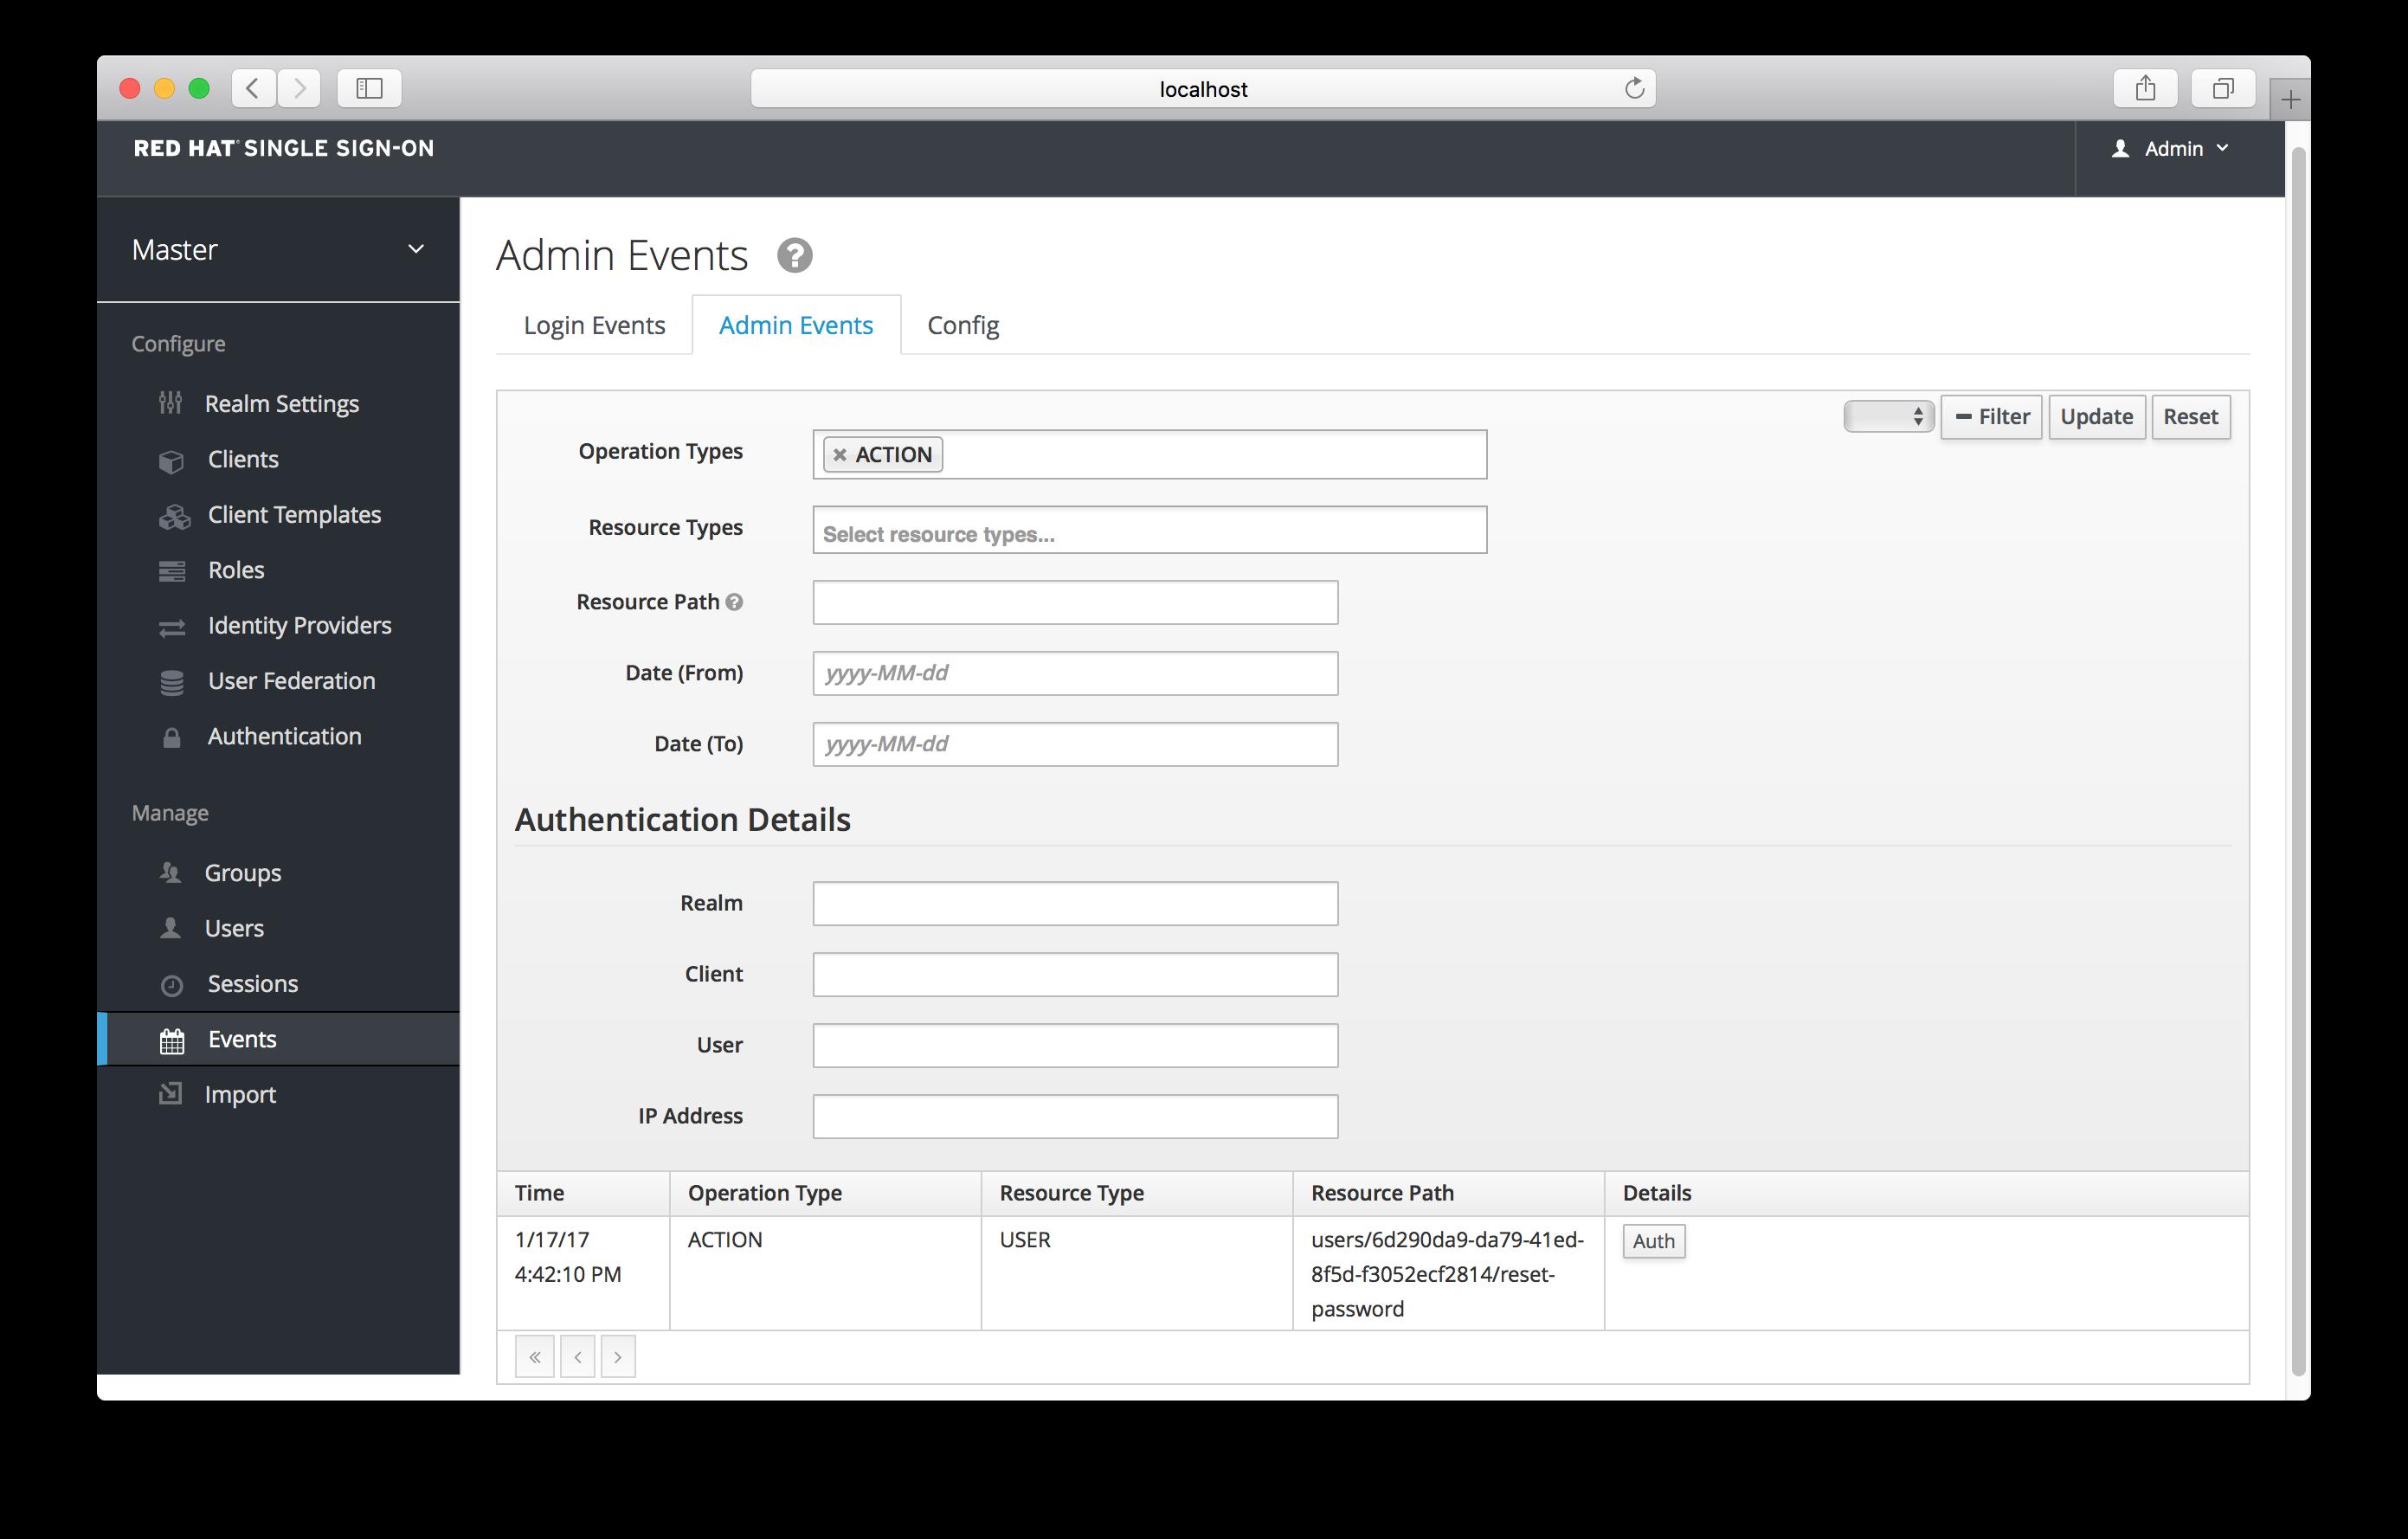 admin events filter